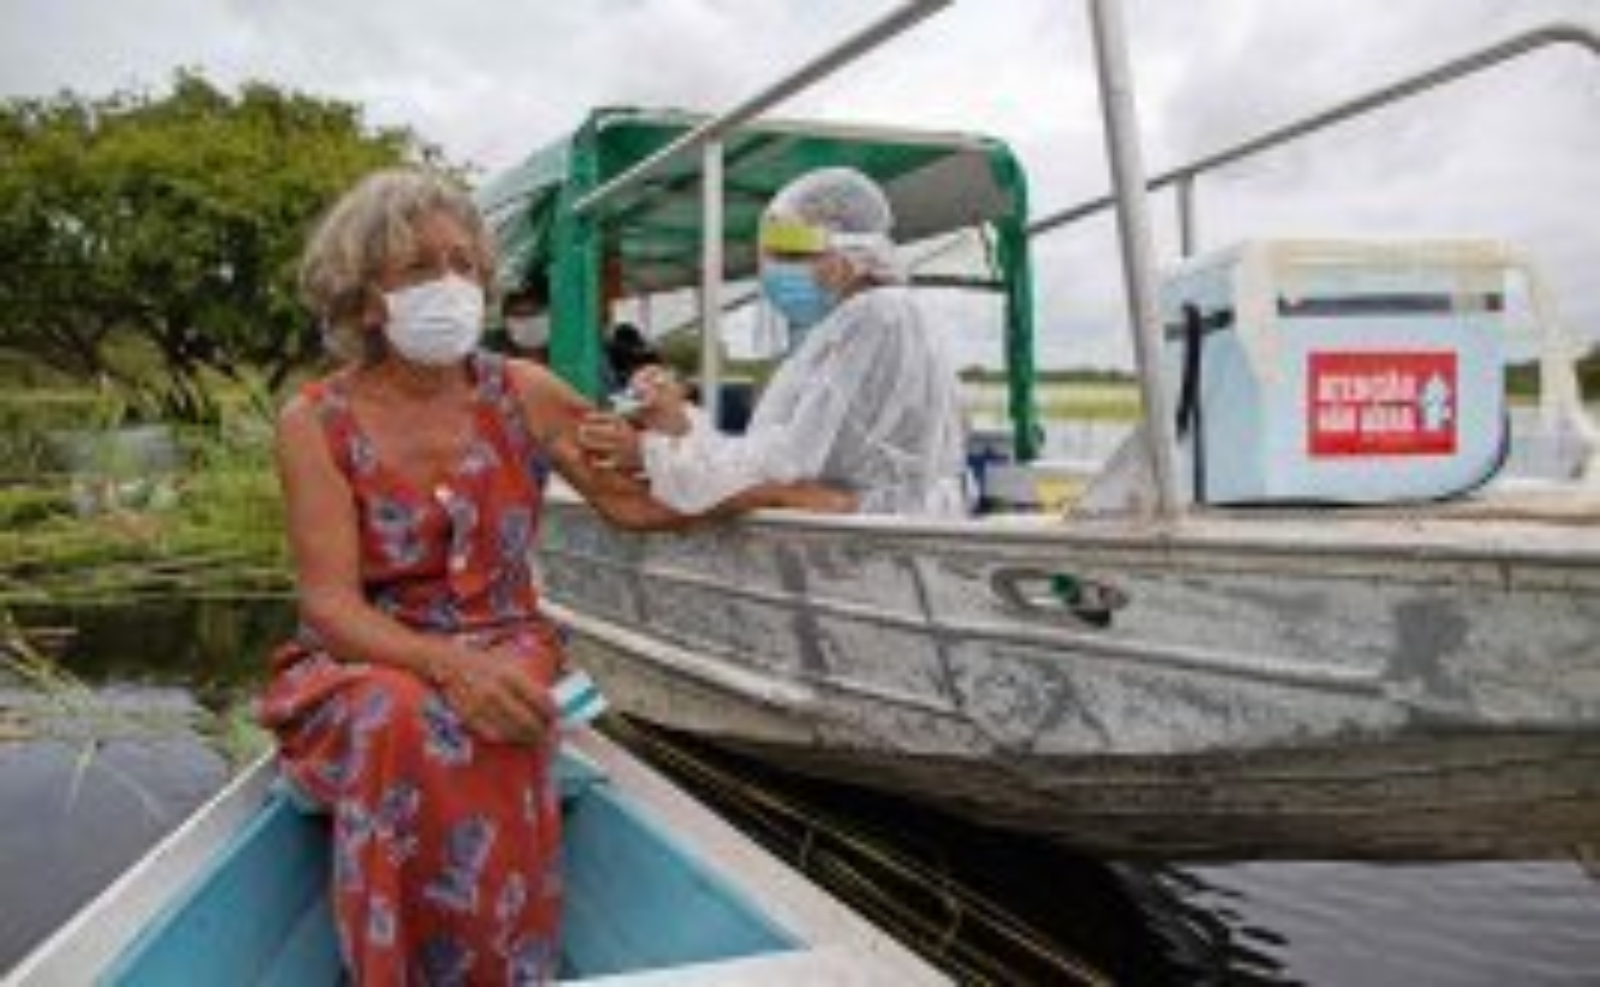 Mass COVID-19 vaccination campaign starts: Part 2